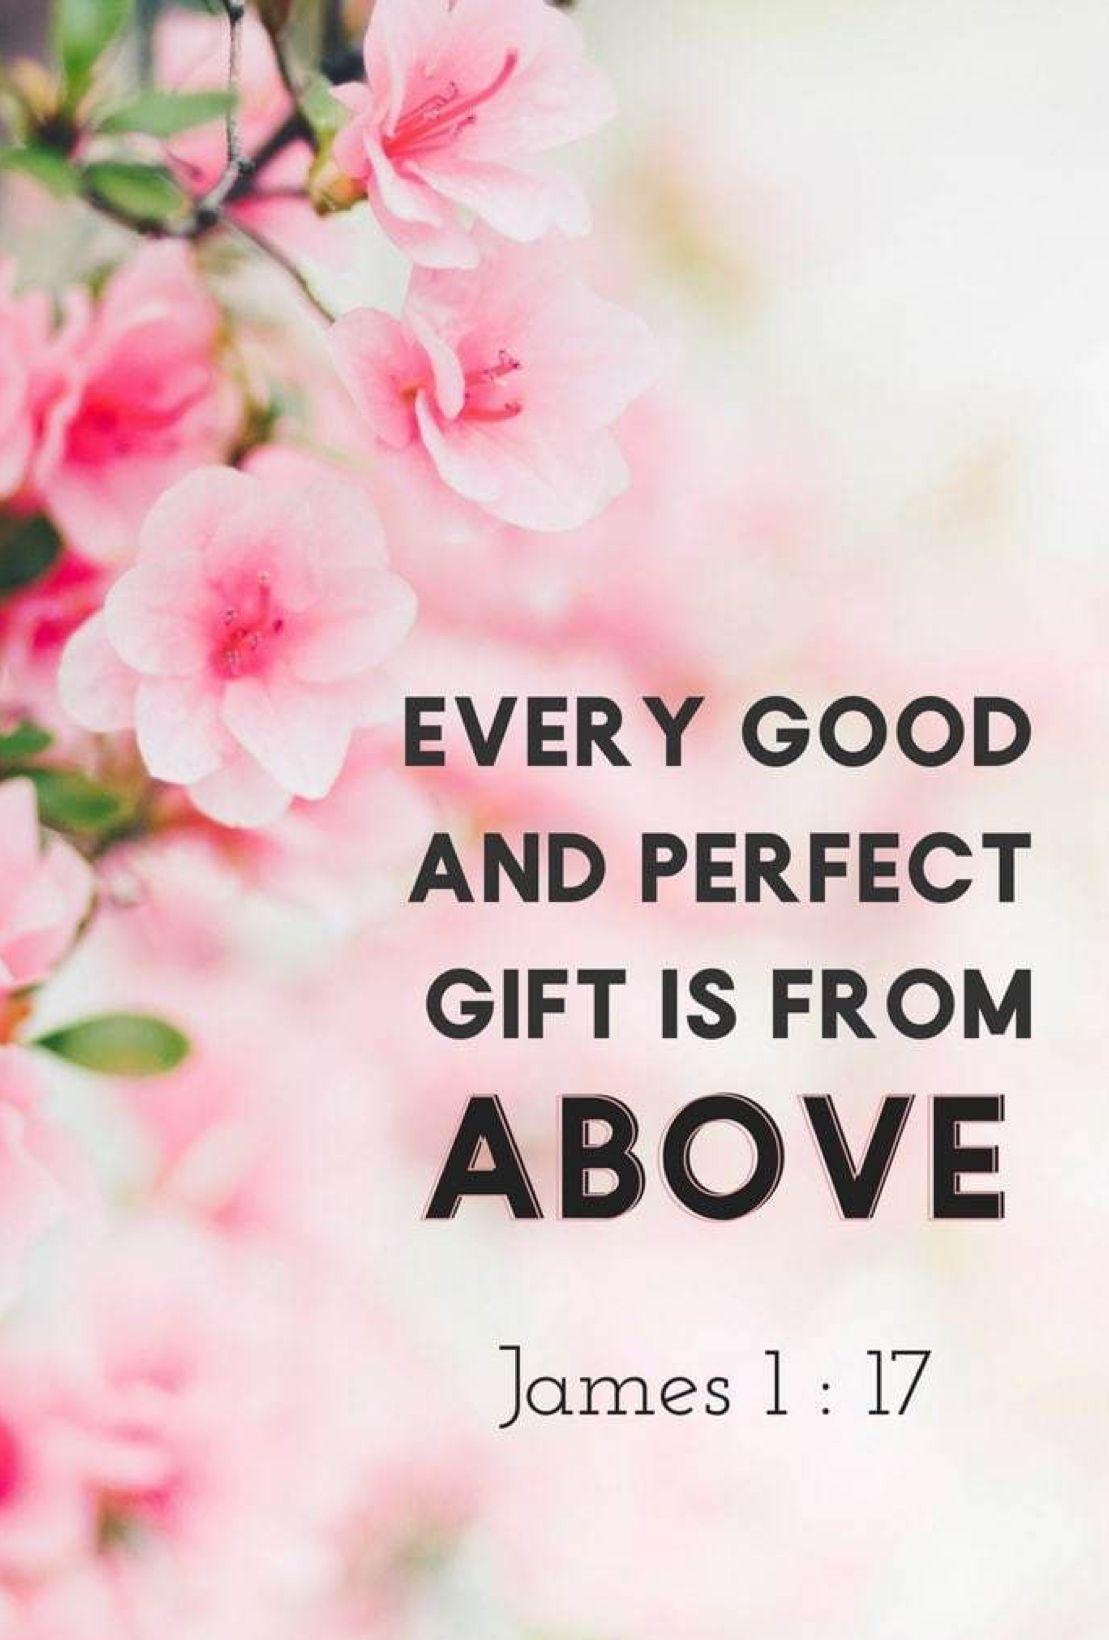 James 1:17 | Scripture quotes, Scripture verses, Biblical quotes